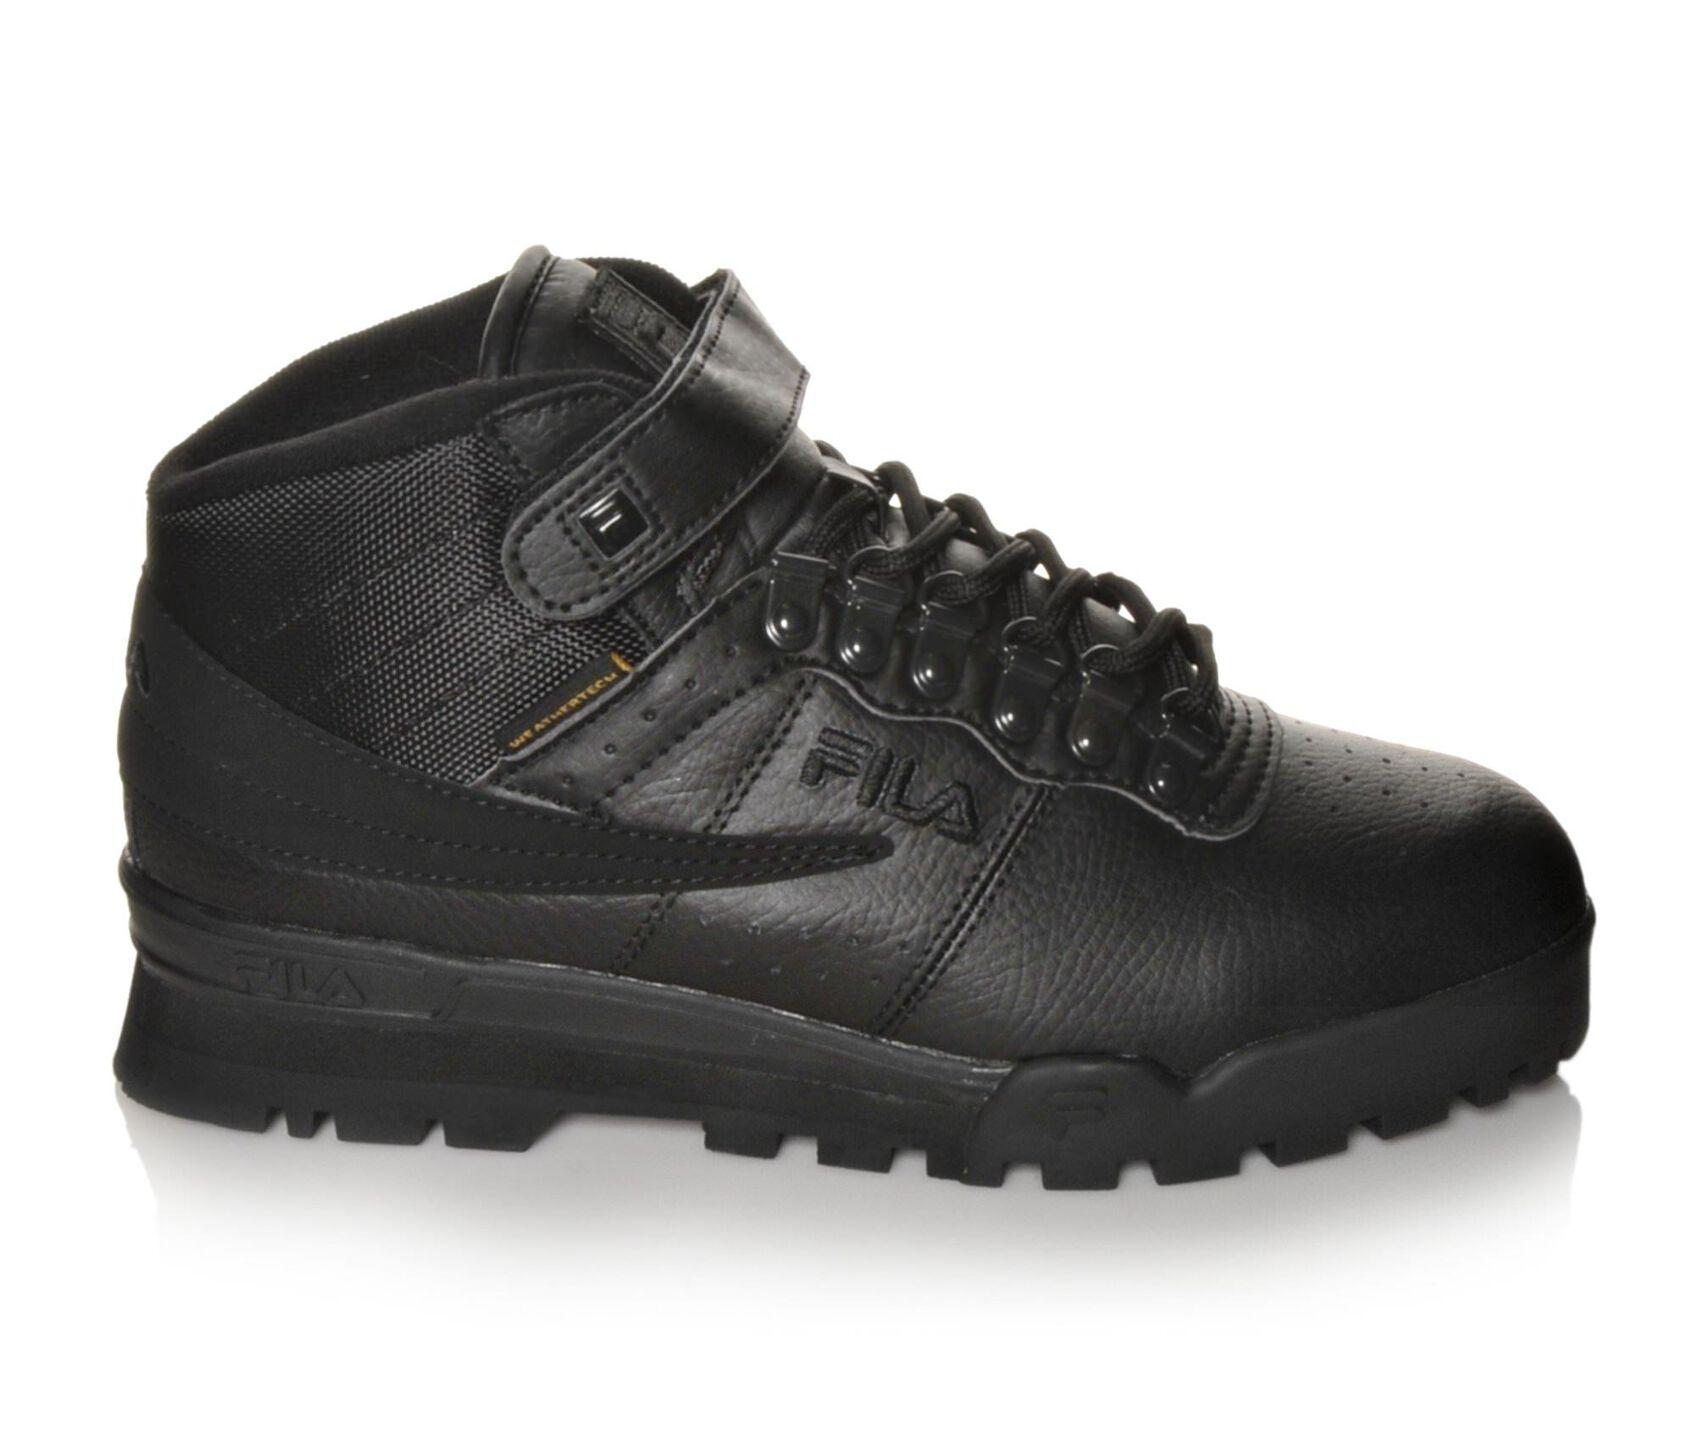 d1fe2e9793cf Men s Fila F13 Weathertech Retro Sneakers